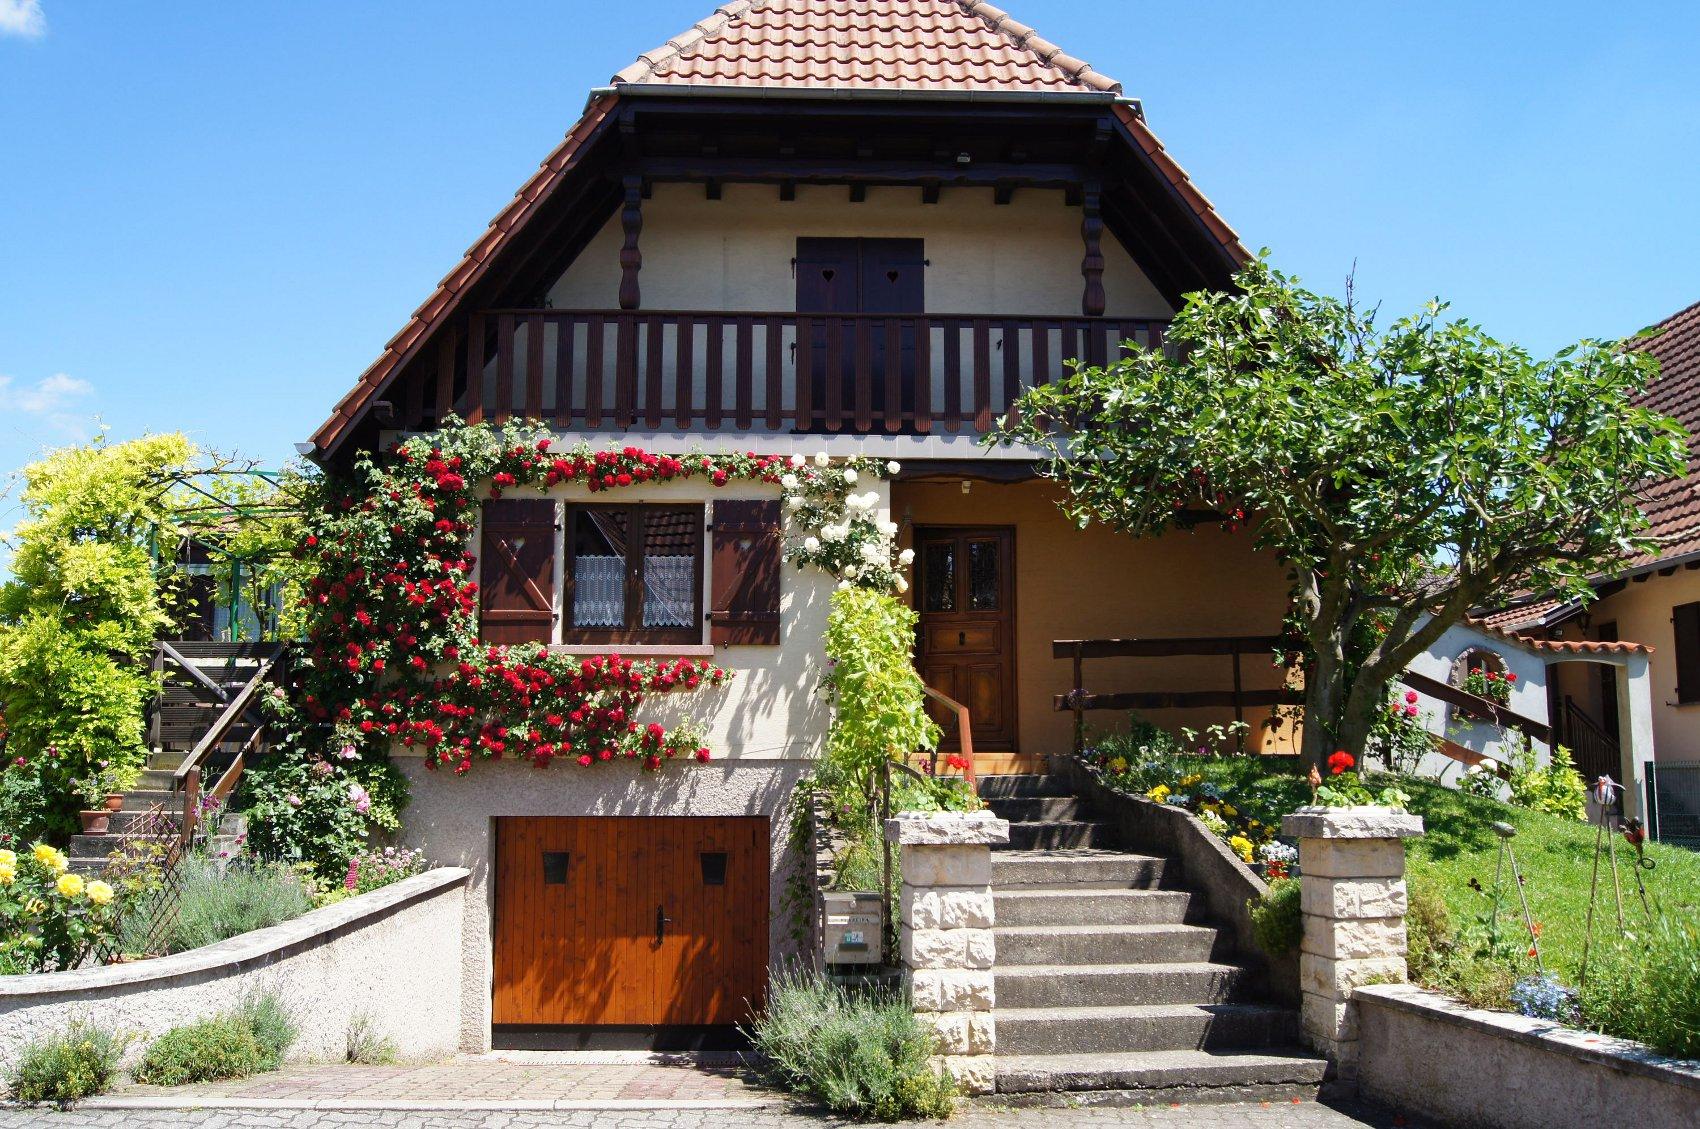 Location de vacances de Bernadette FERREIRA